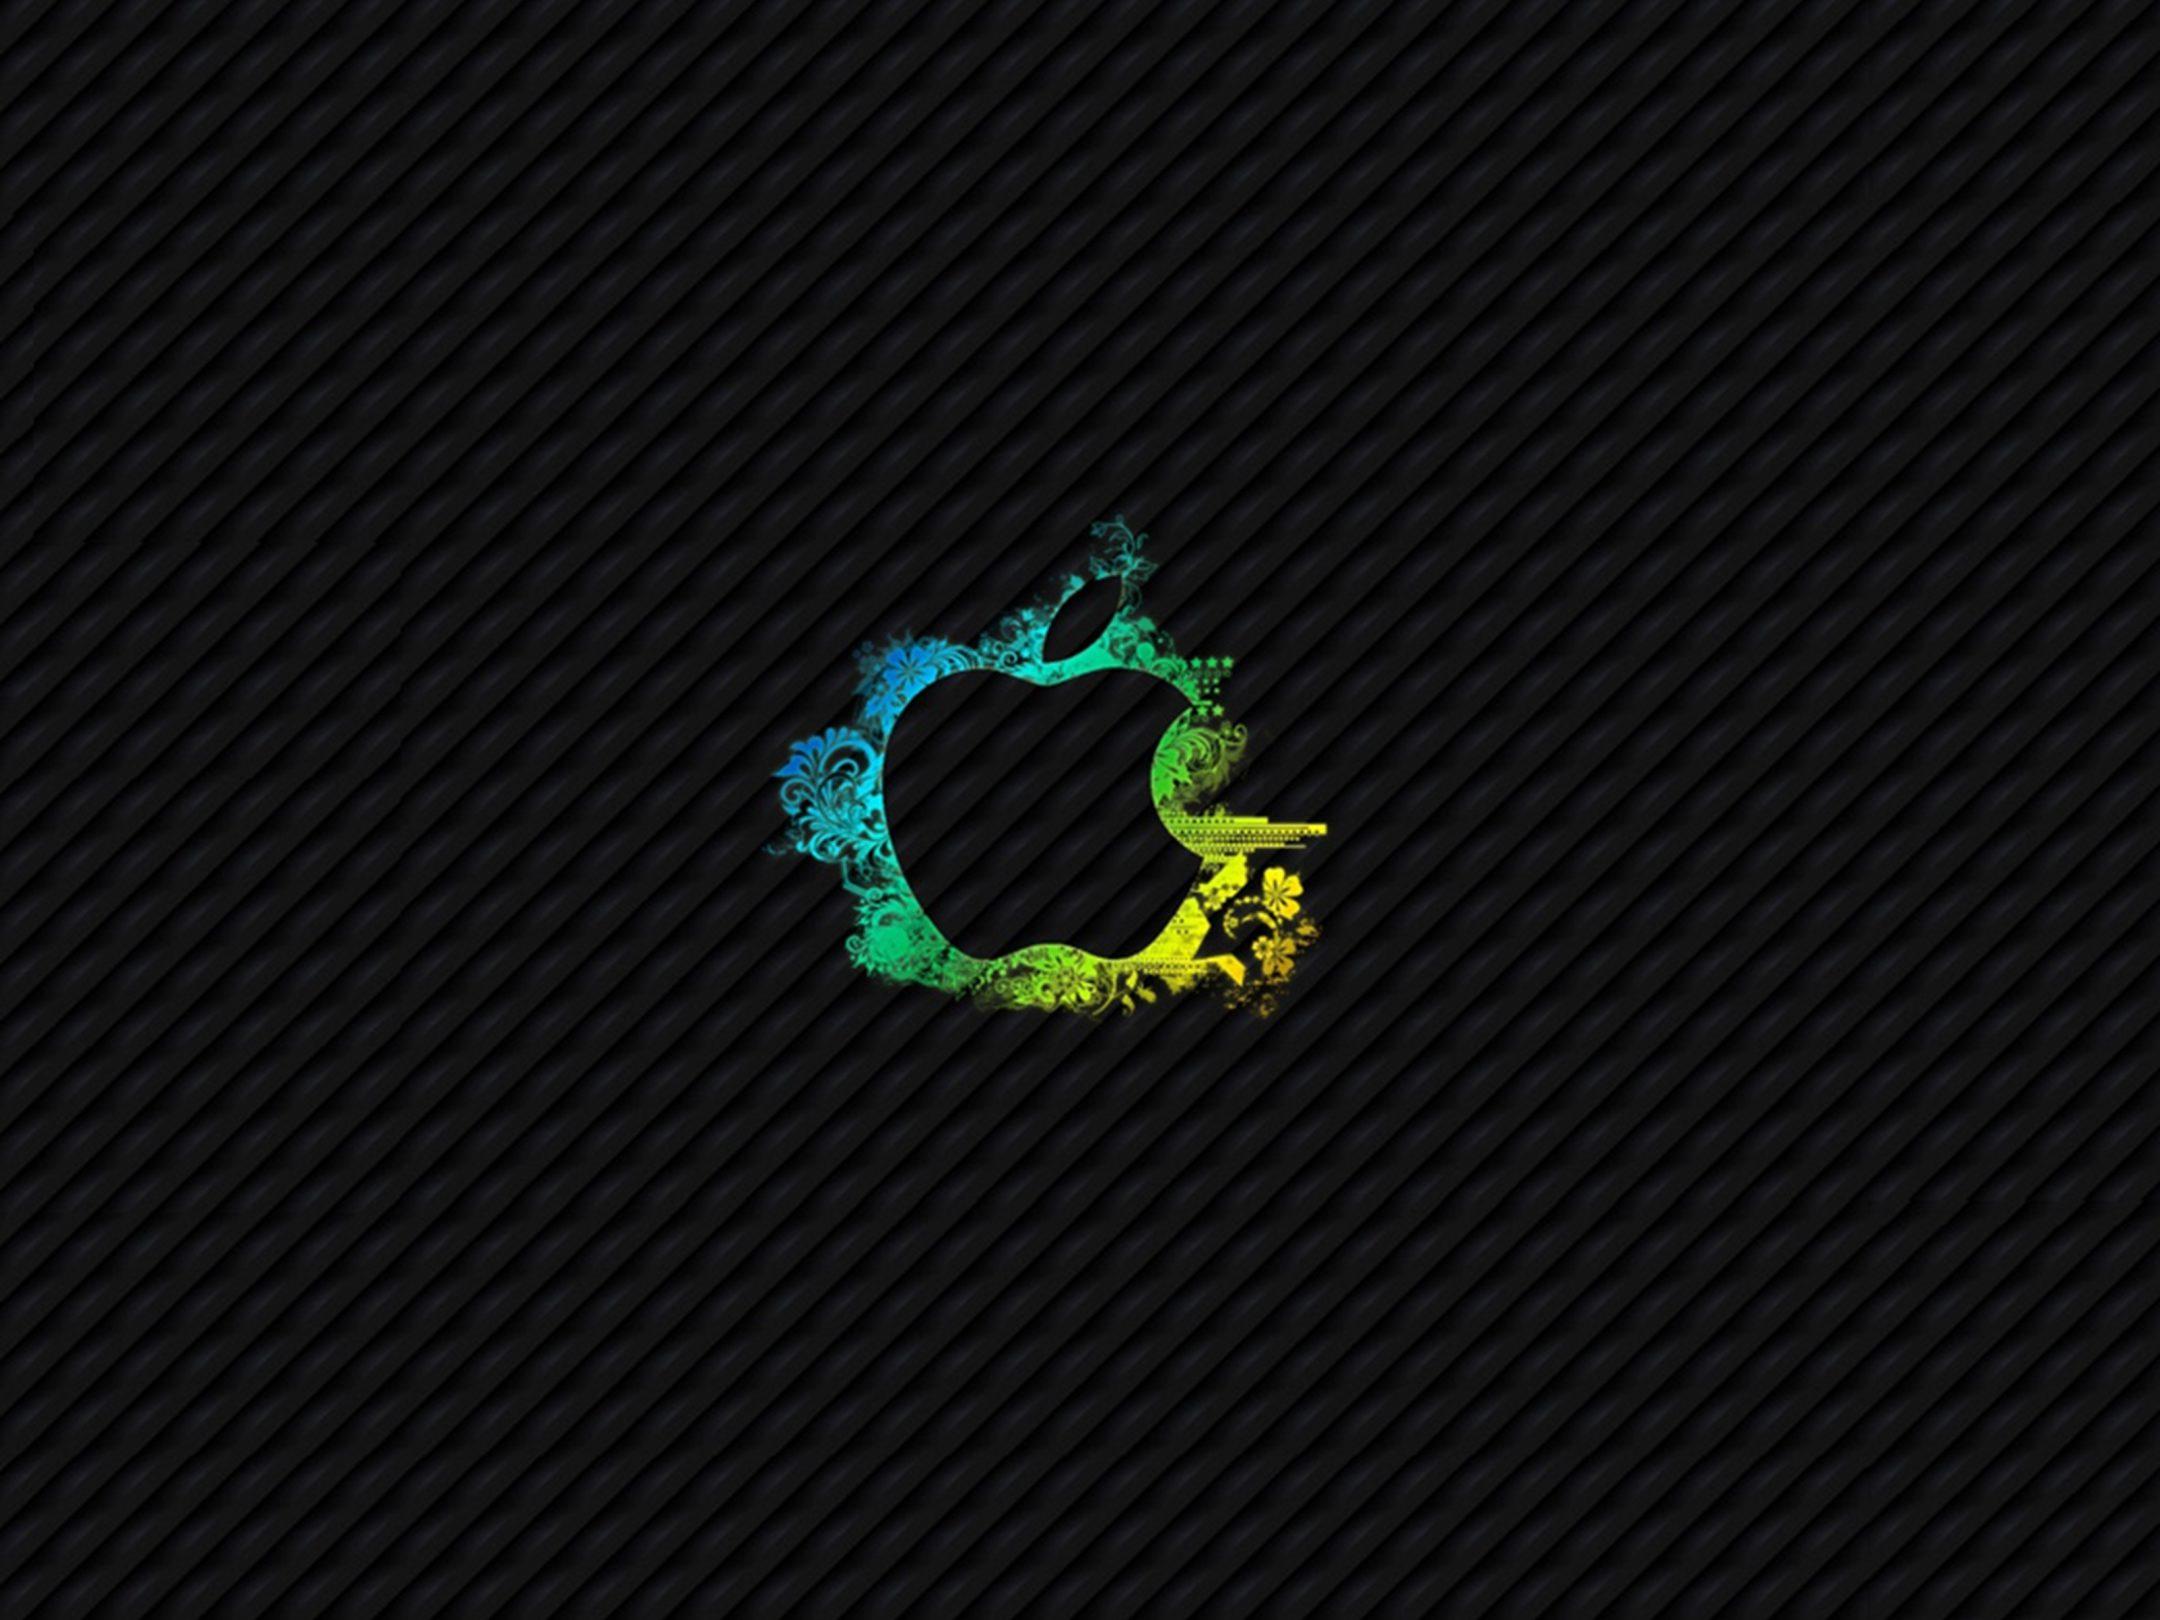 2160x1620 iPad wallpaper 4k Apple Wallpaper Ipad Wallpaper 2160x1620 pixels resolution